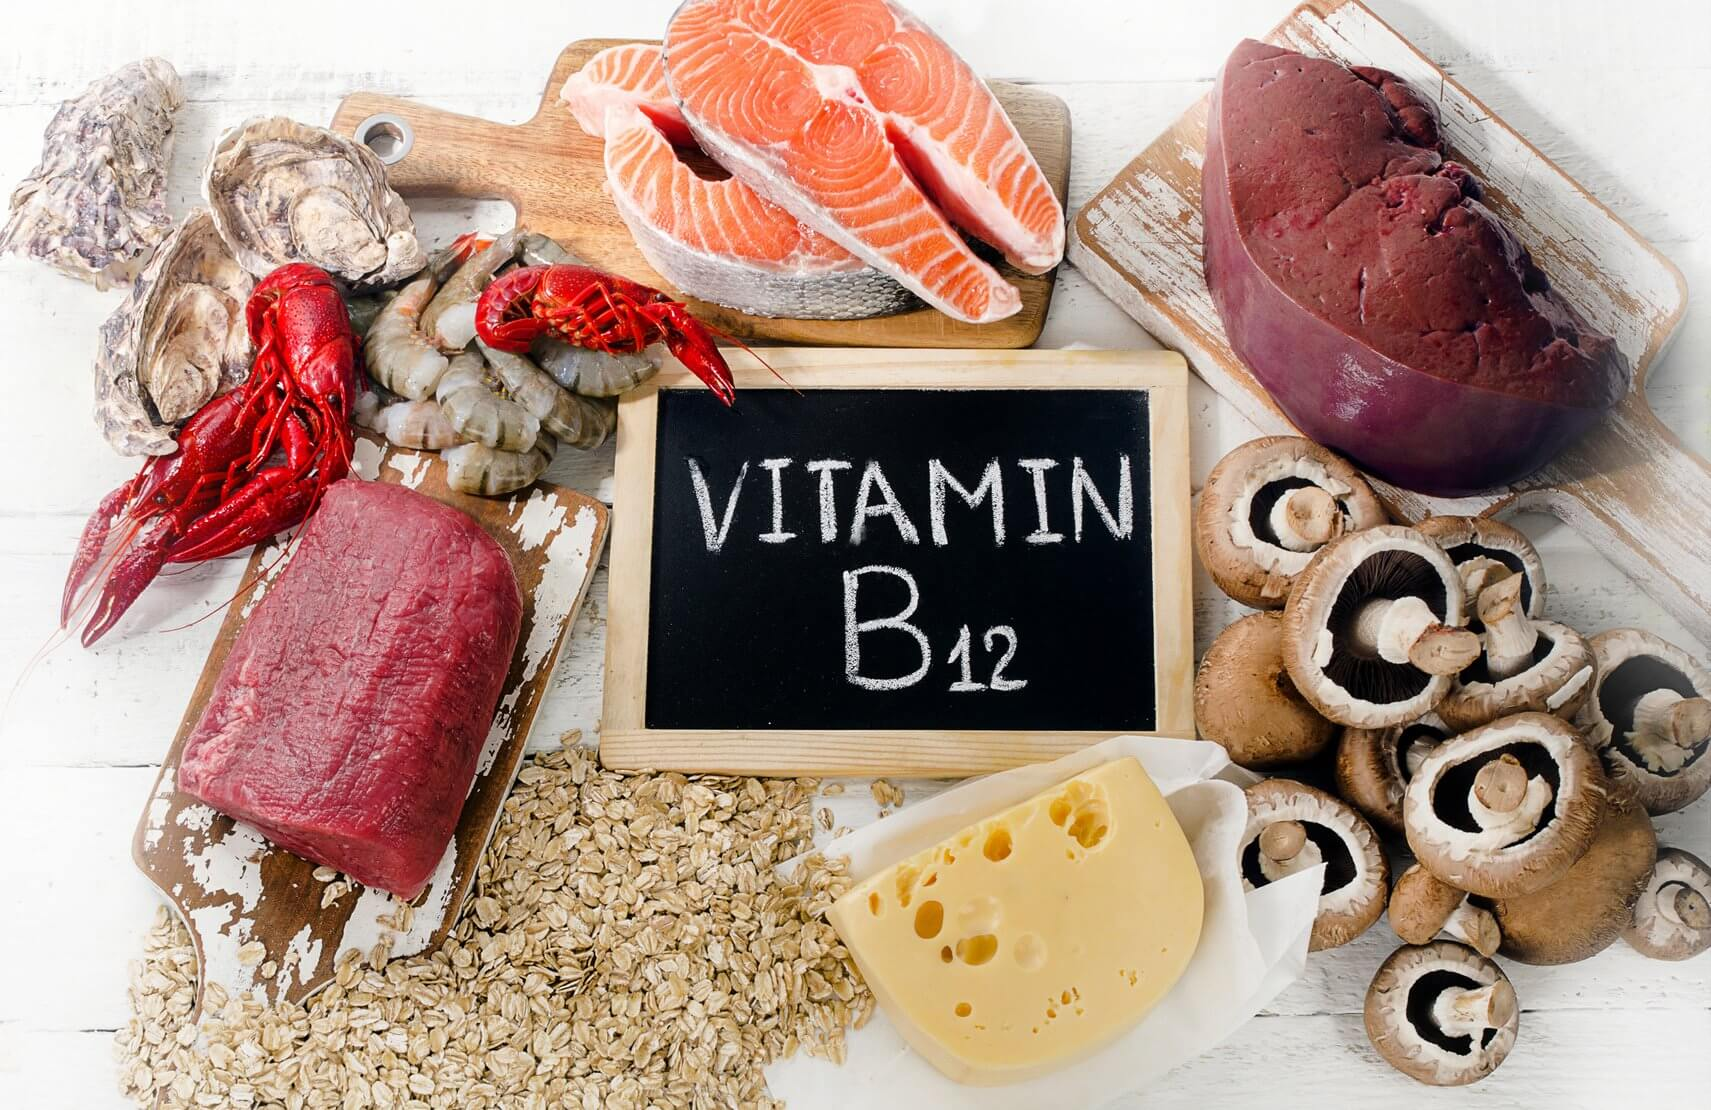 ᐉ Витамин B12 (Б12, Кобаламин) - влияние, польза, вред, описание и  применение